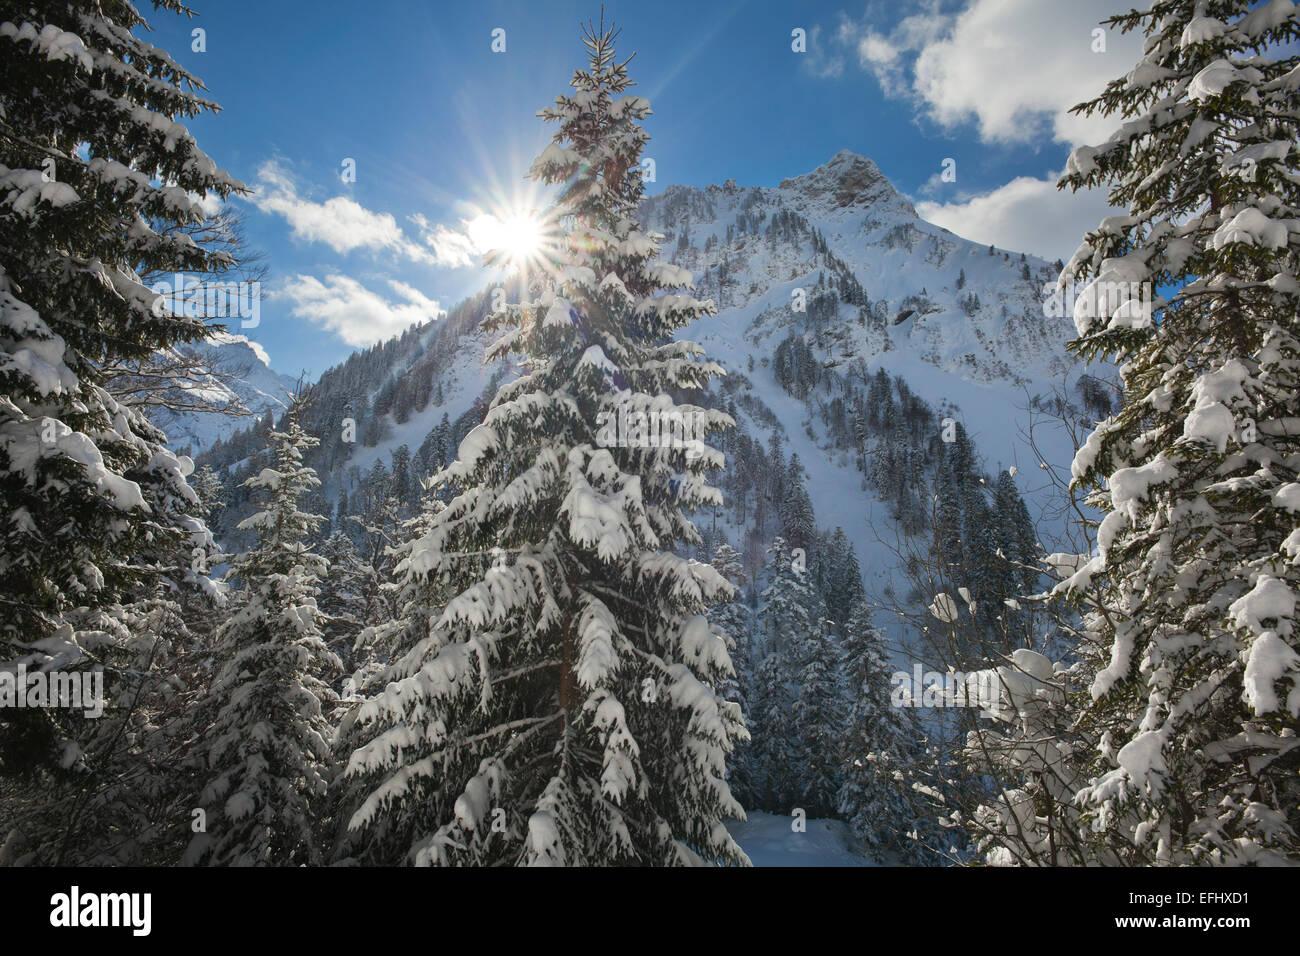 Winter landscape in Hintersteiner valley near Bad Hindelang, view to Giebel, Allgaeu, Bavaria, Germany - Stock Image